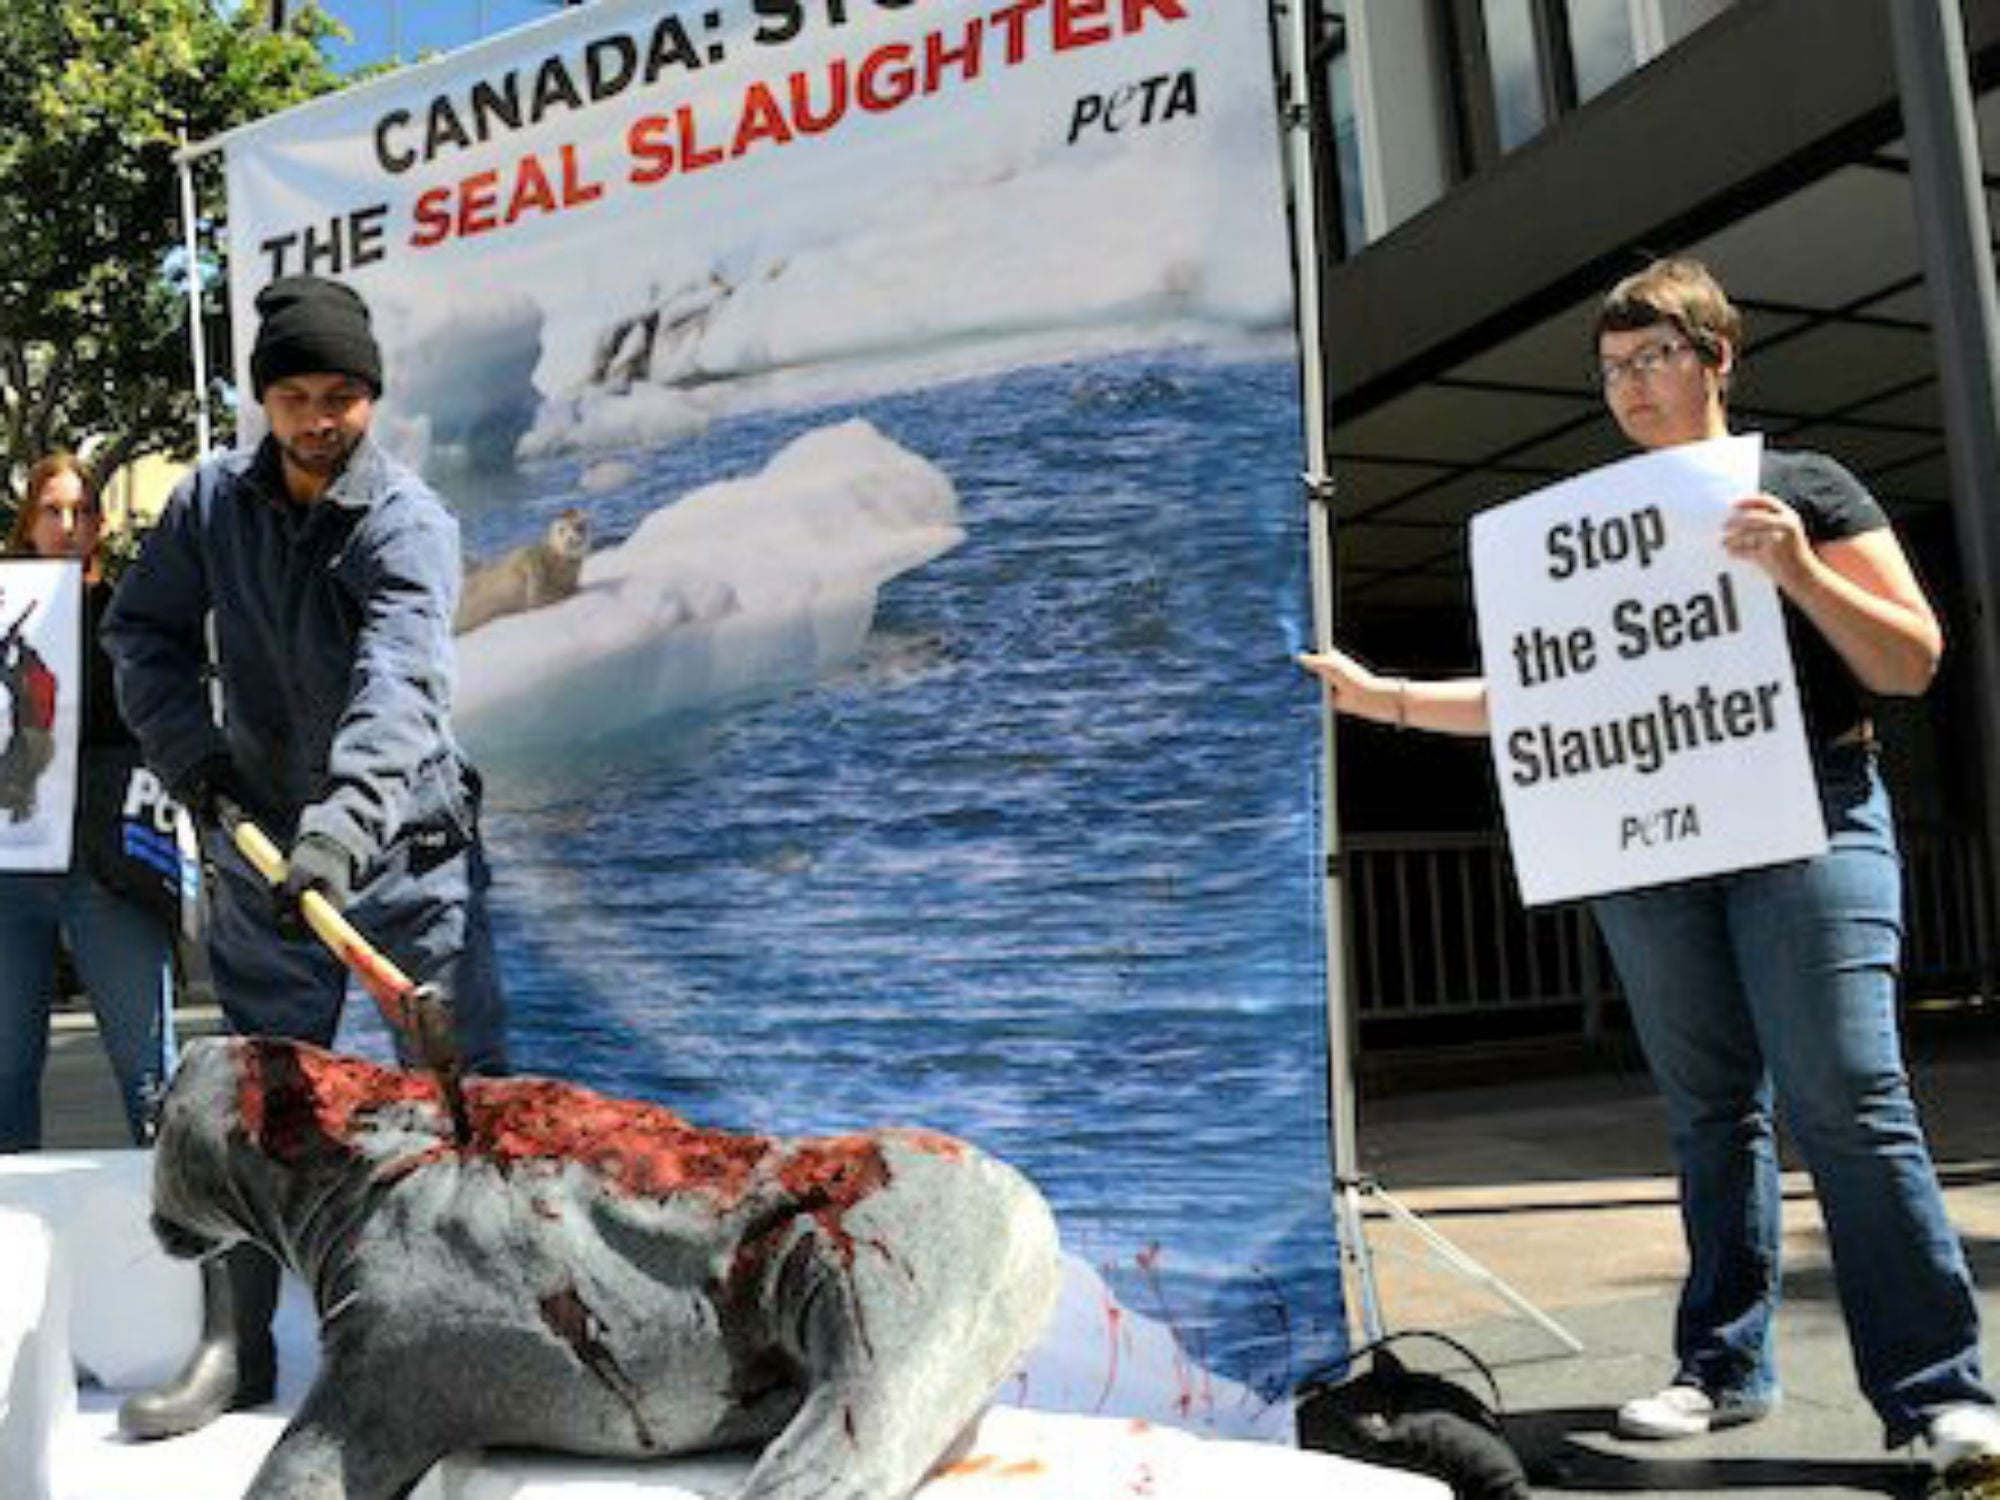 Inside Canada's Divisive Seal Hunt